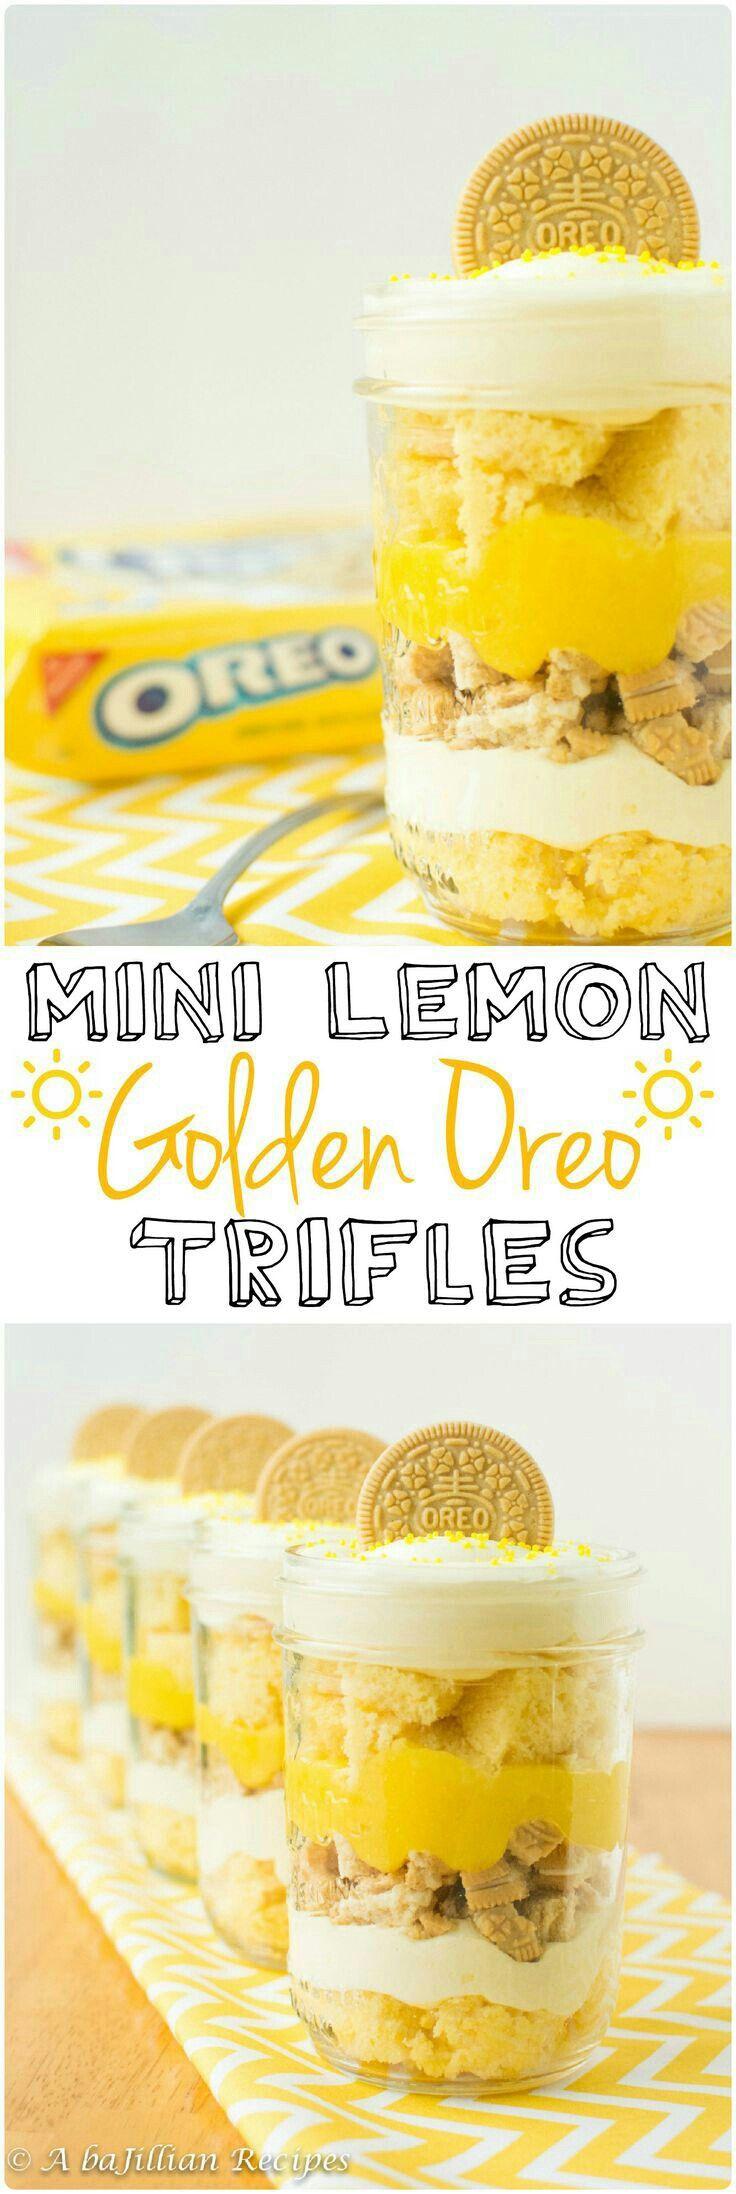 Mini Lemon Golden Oreo Trifles